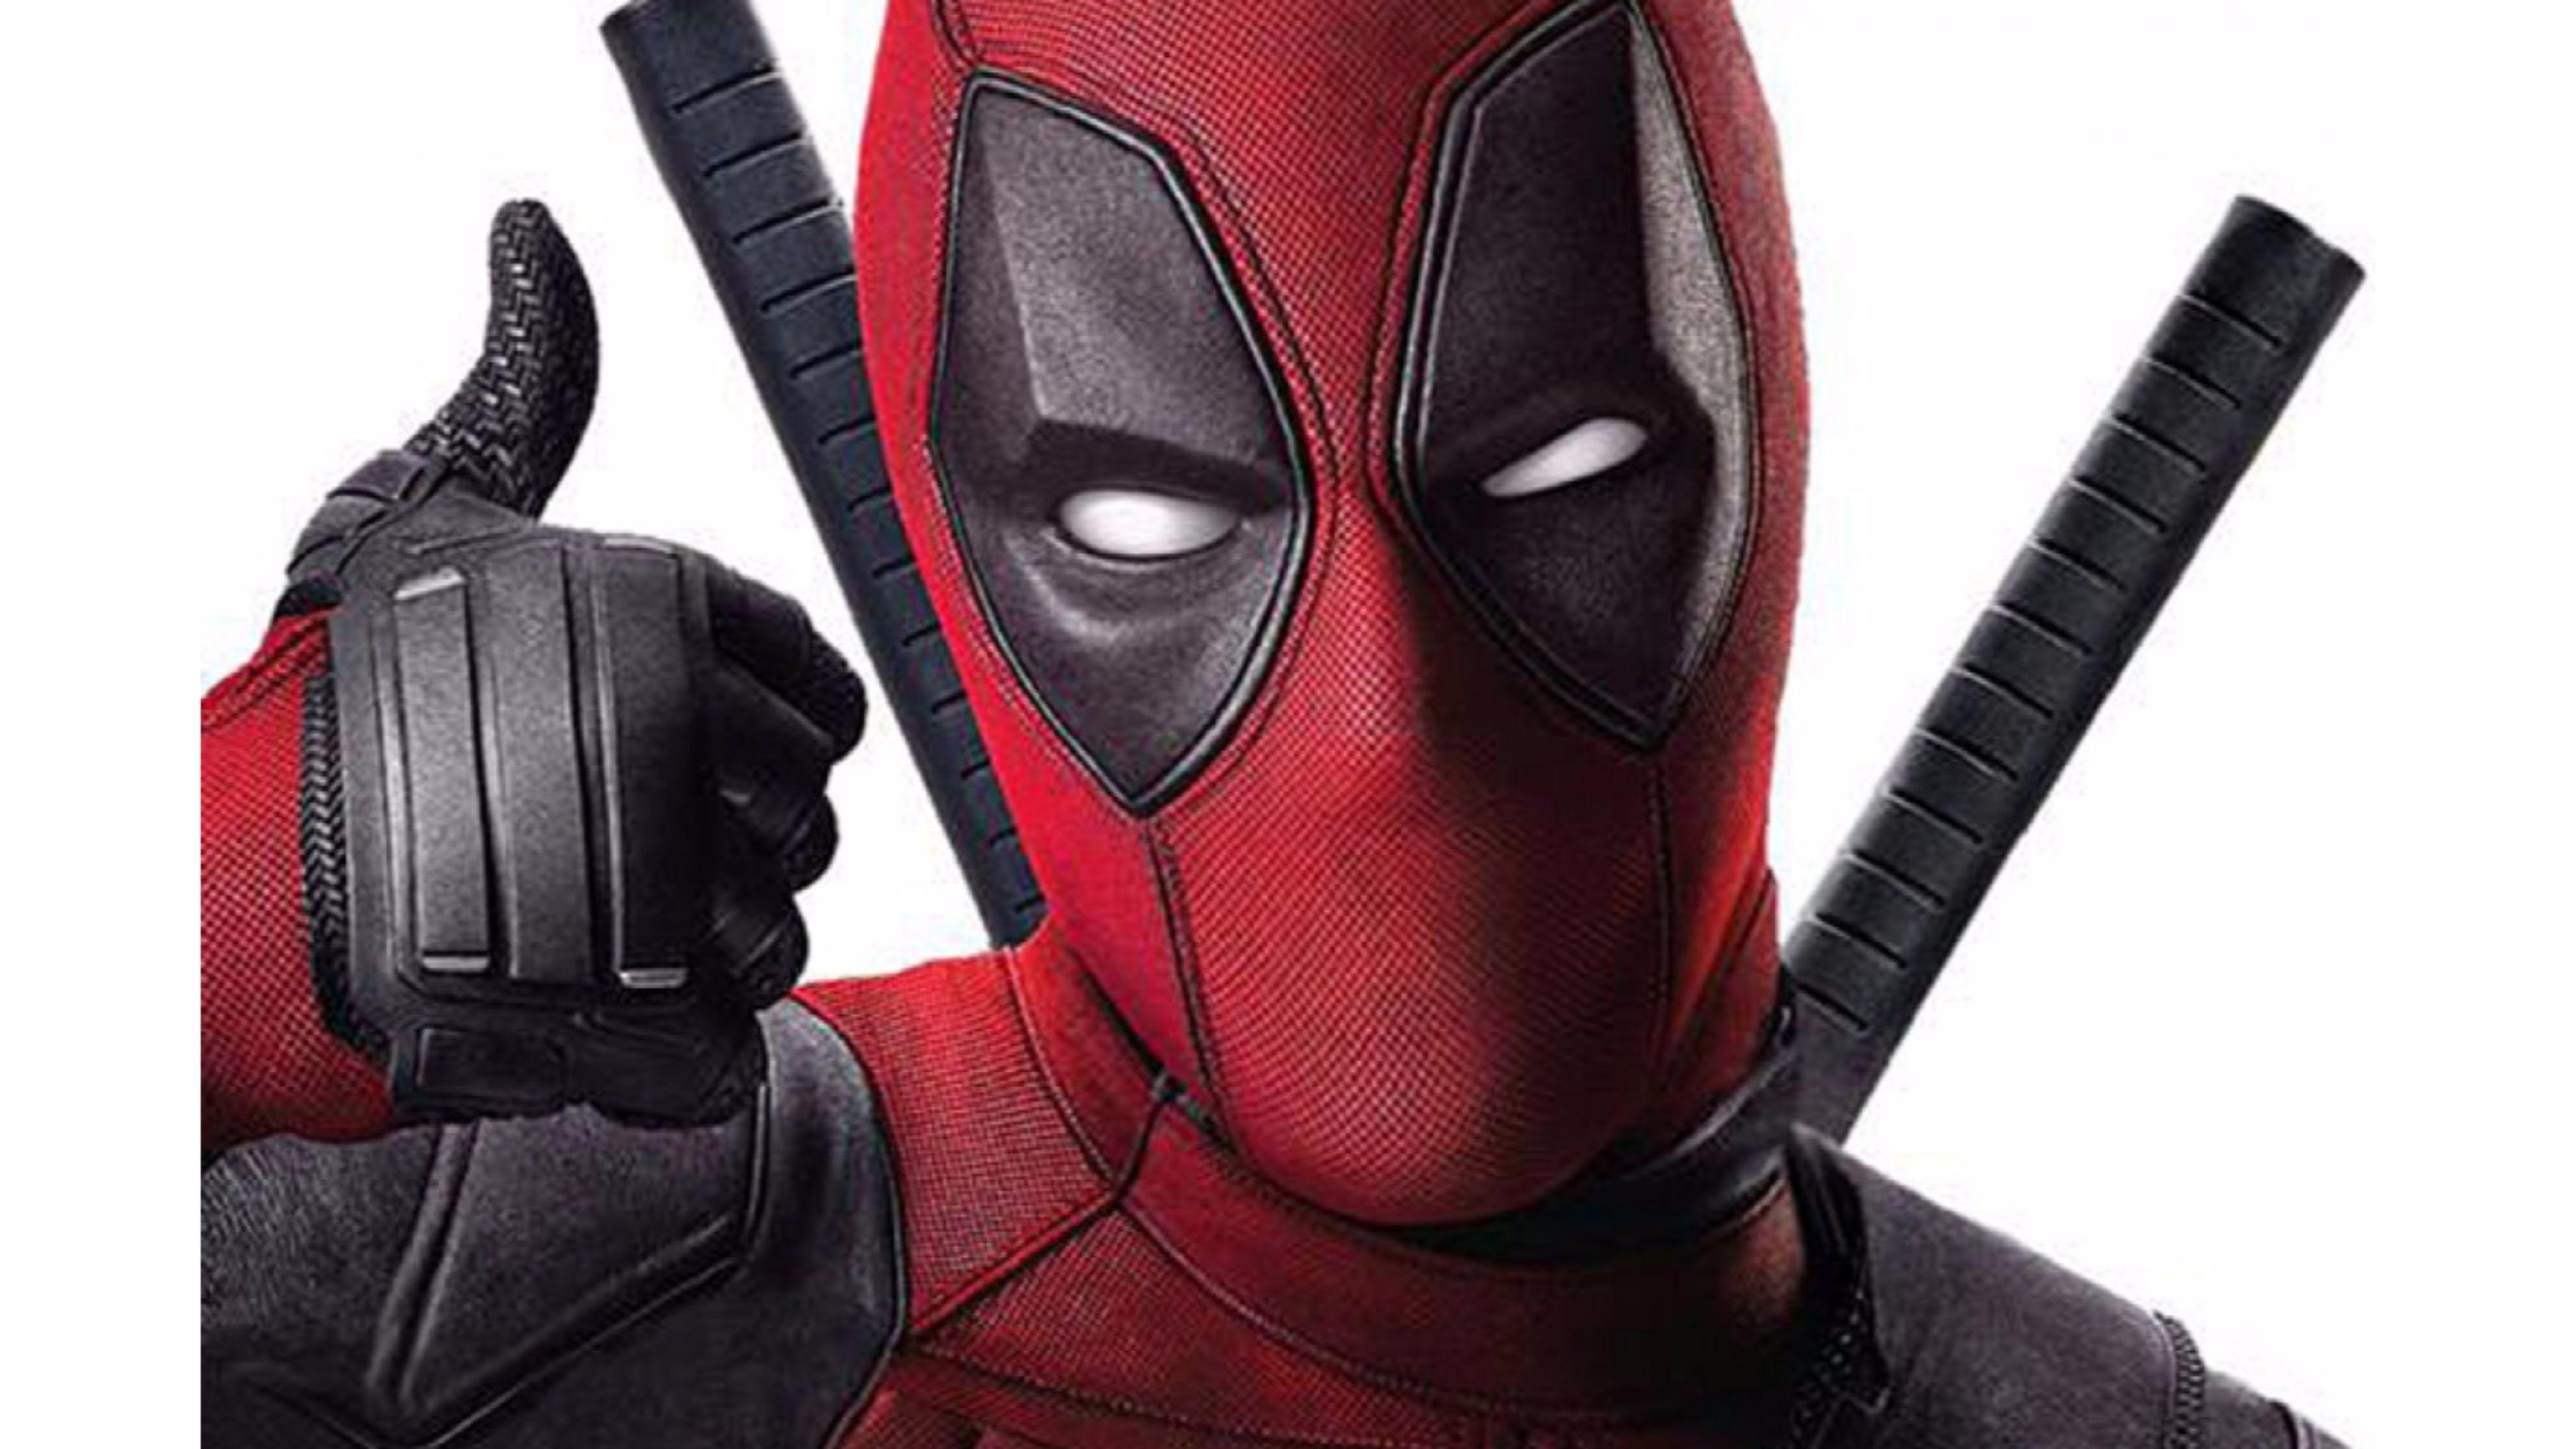 Res: 3840x2160, Trending Deadpool Movie 4K Wallpaper